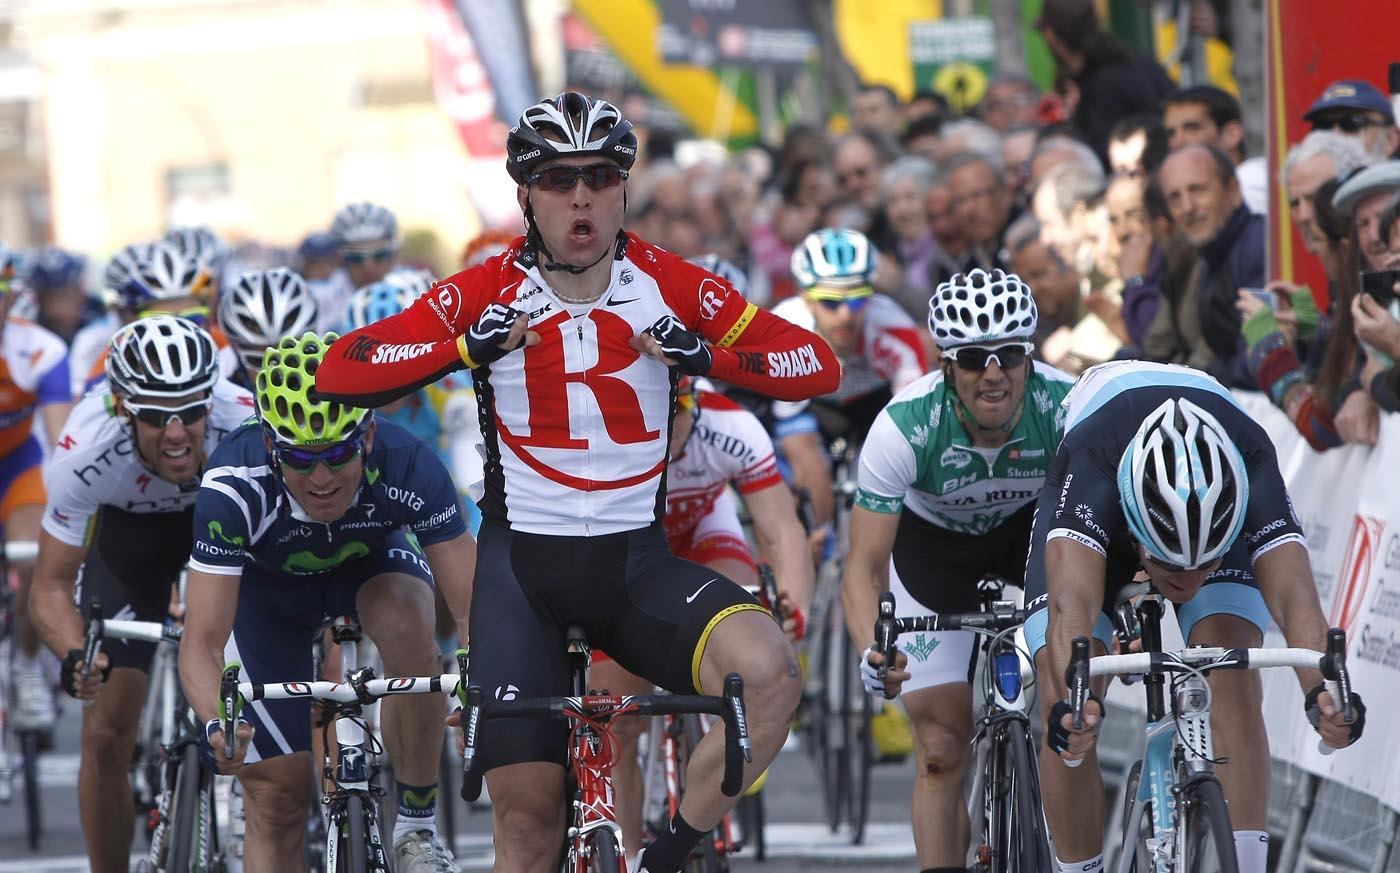 Manuel Cardoso, Volta a Catalunya 2011, stage four